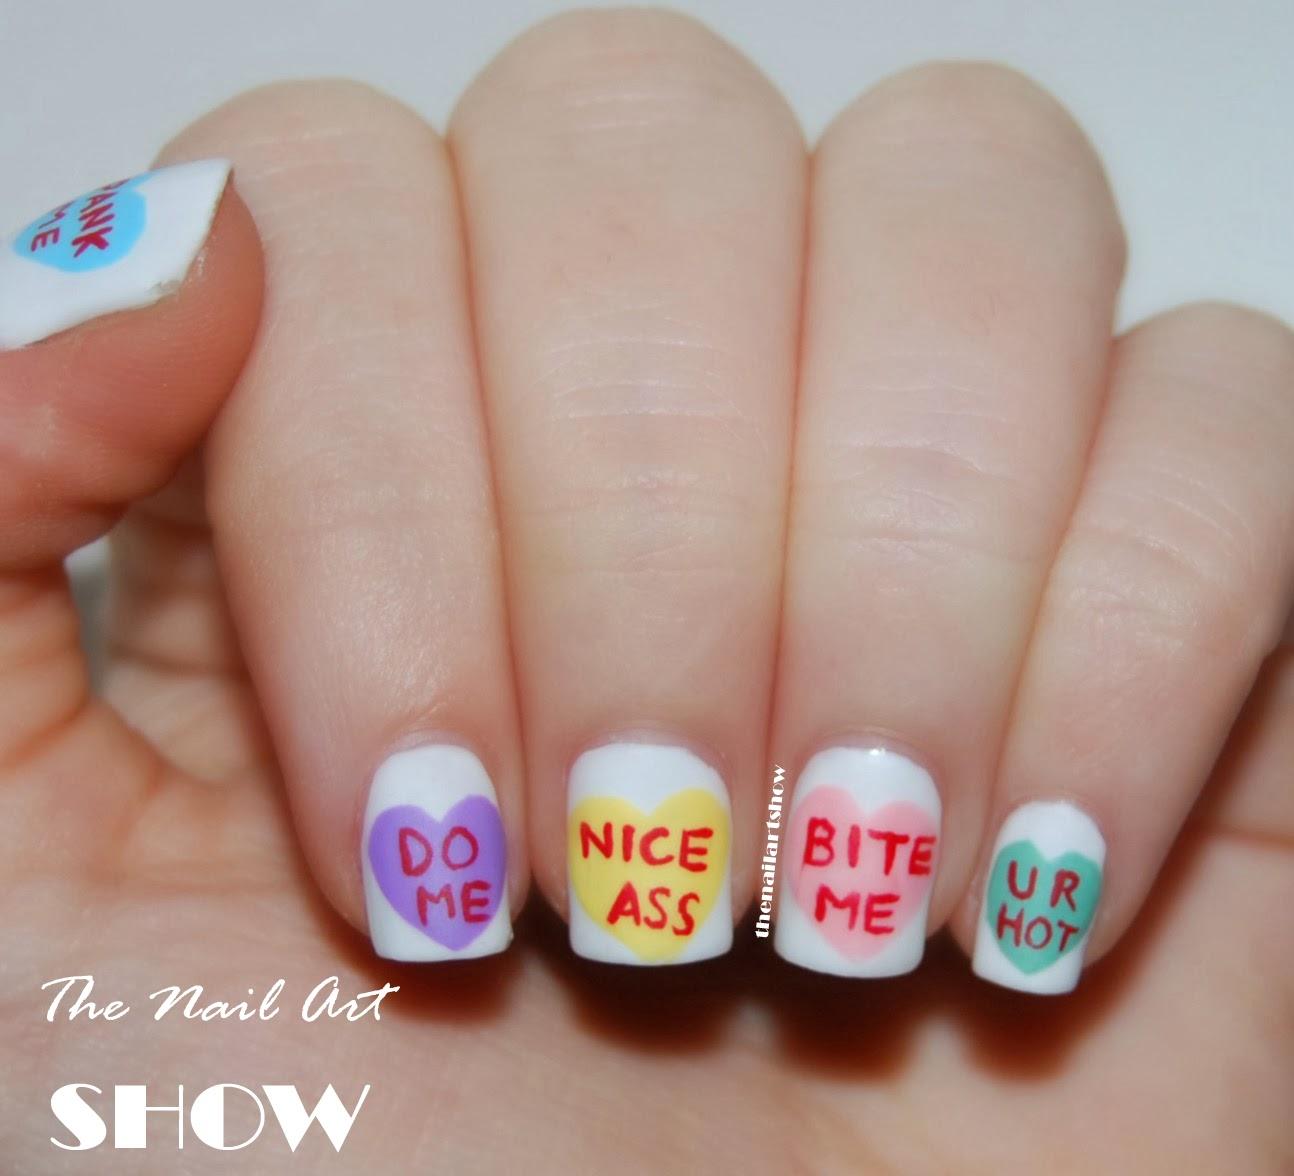 The Nail Art Show Naughty Valentine